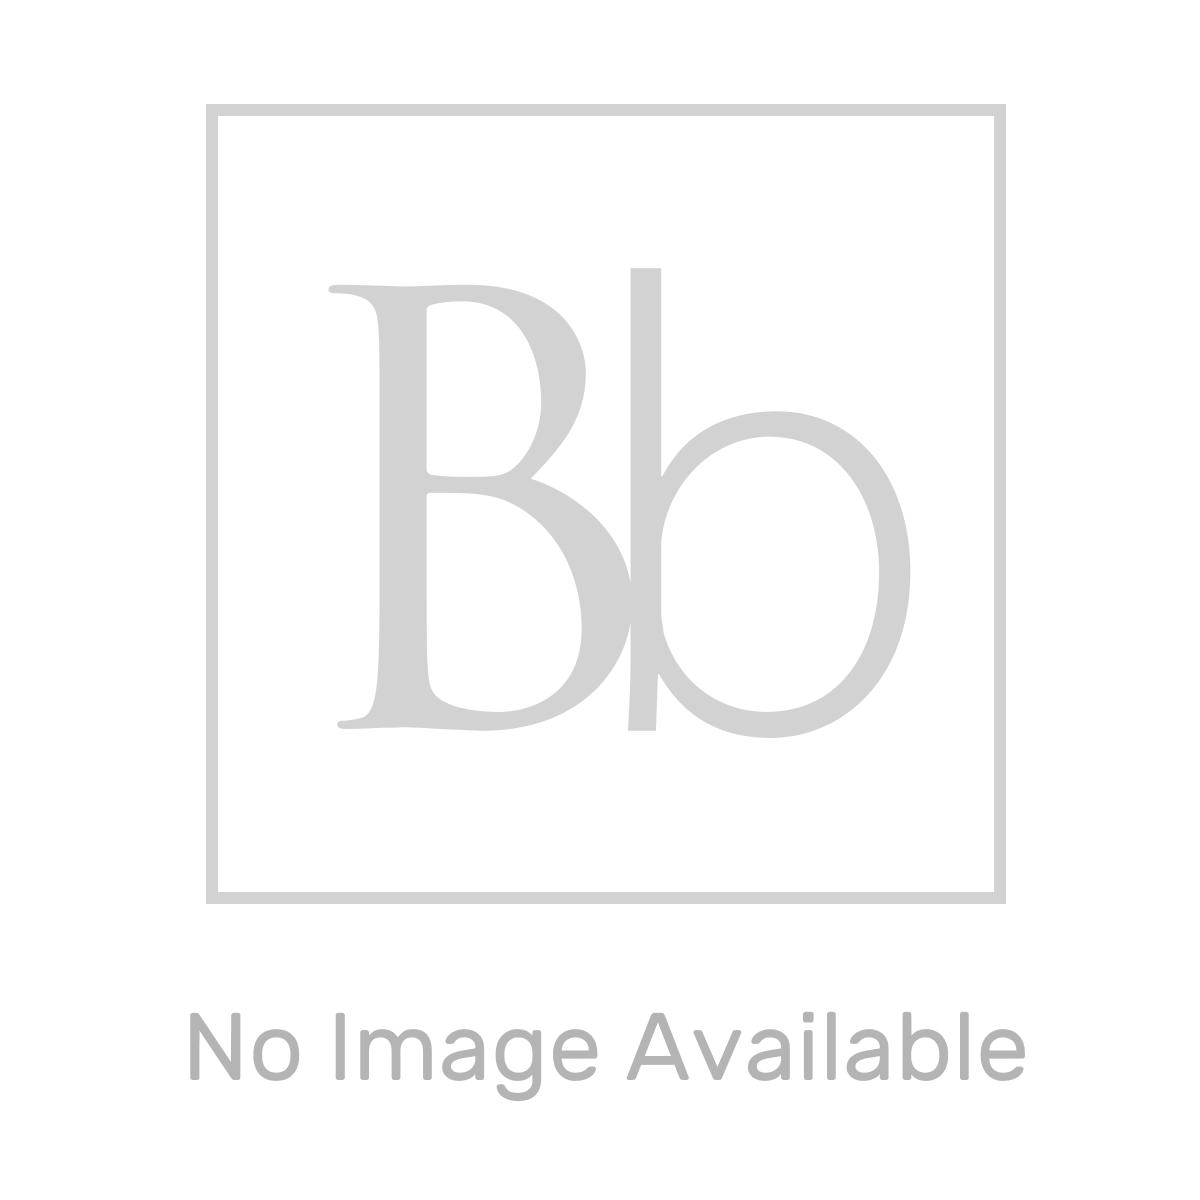 RAK Washington Cappucino Bathroom Mirror 800mm